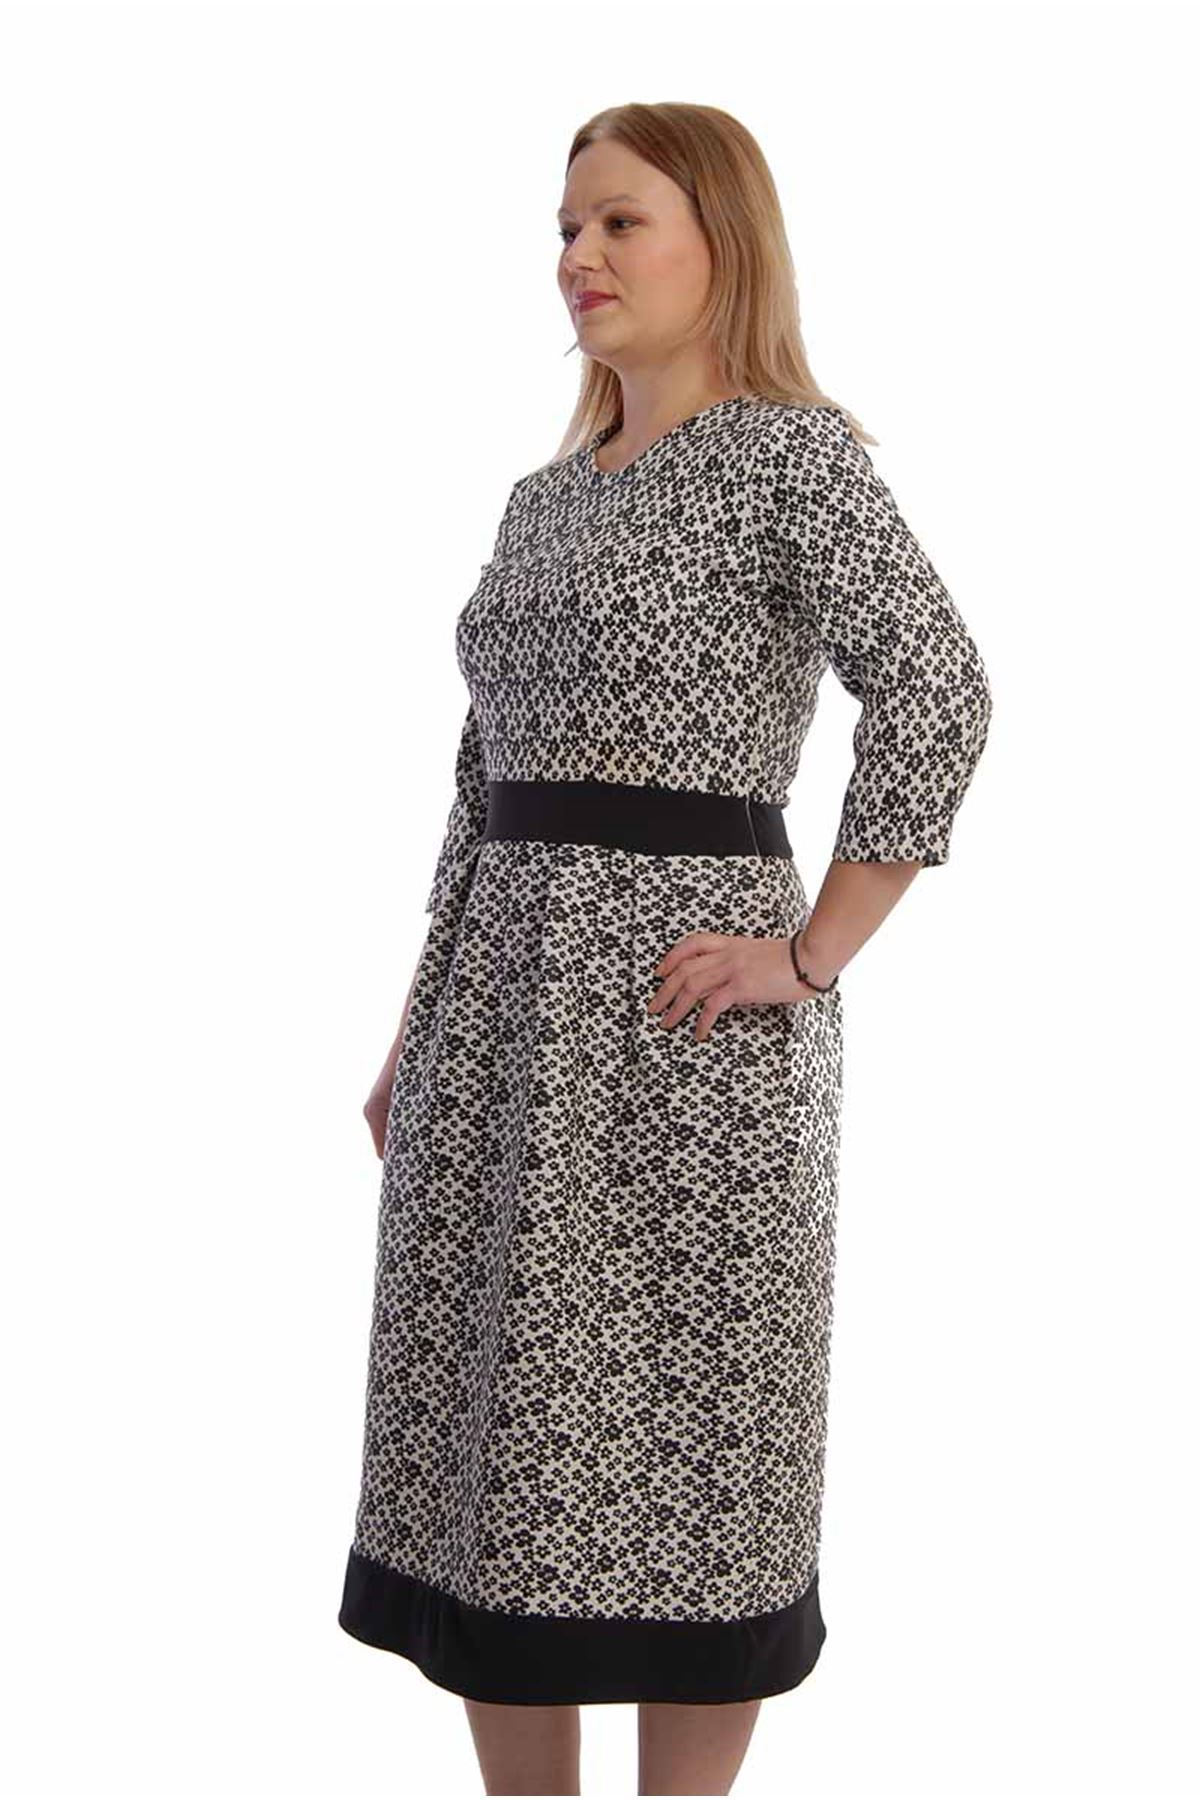 Siyah Belden Oturtma Elbise F9-65539